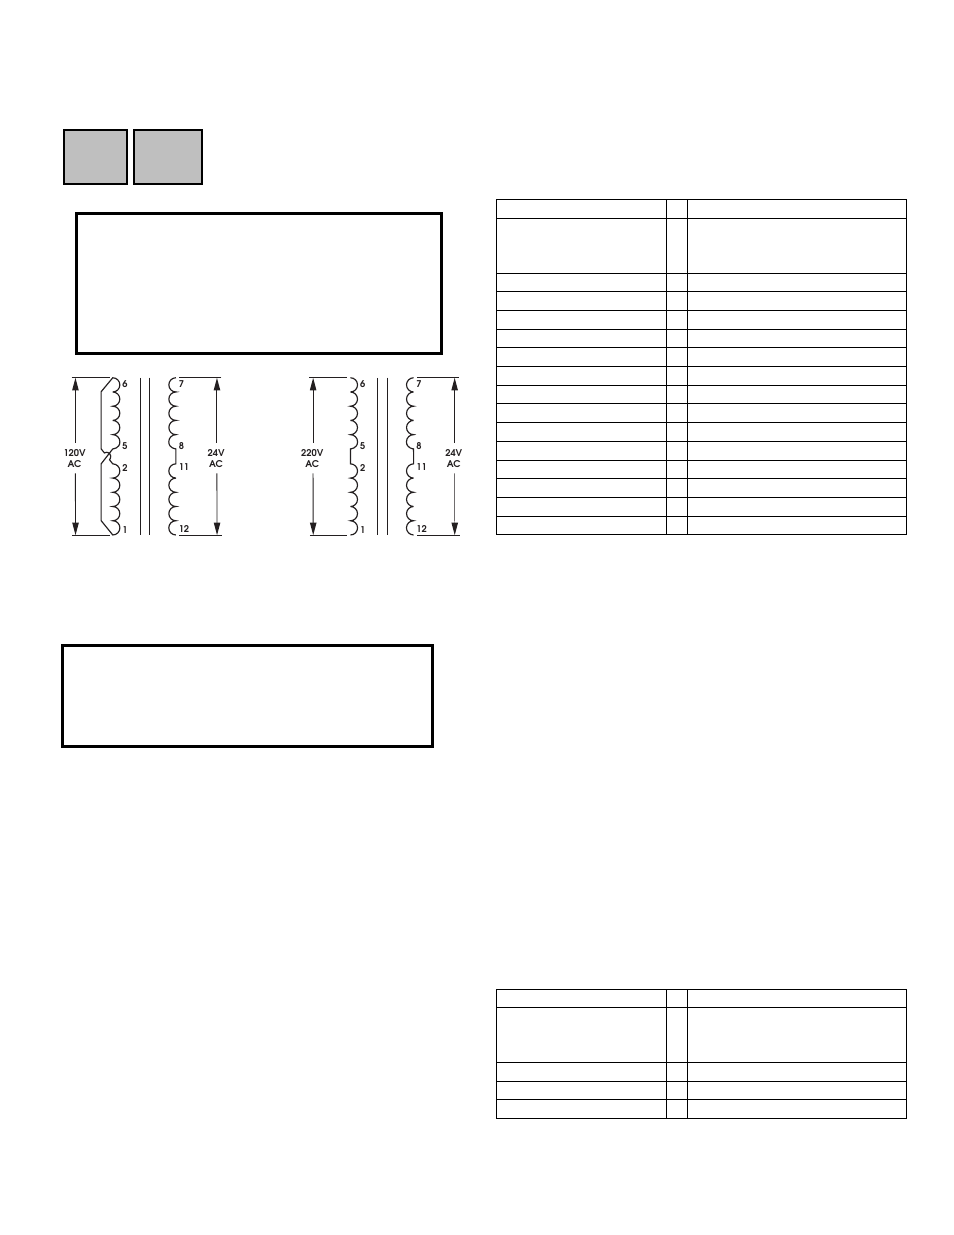 Ratings, Controller screens, Setting controller | Leslie Controls ...